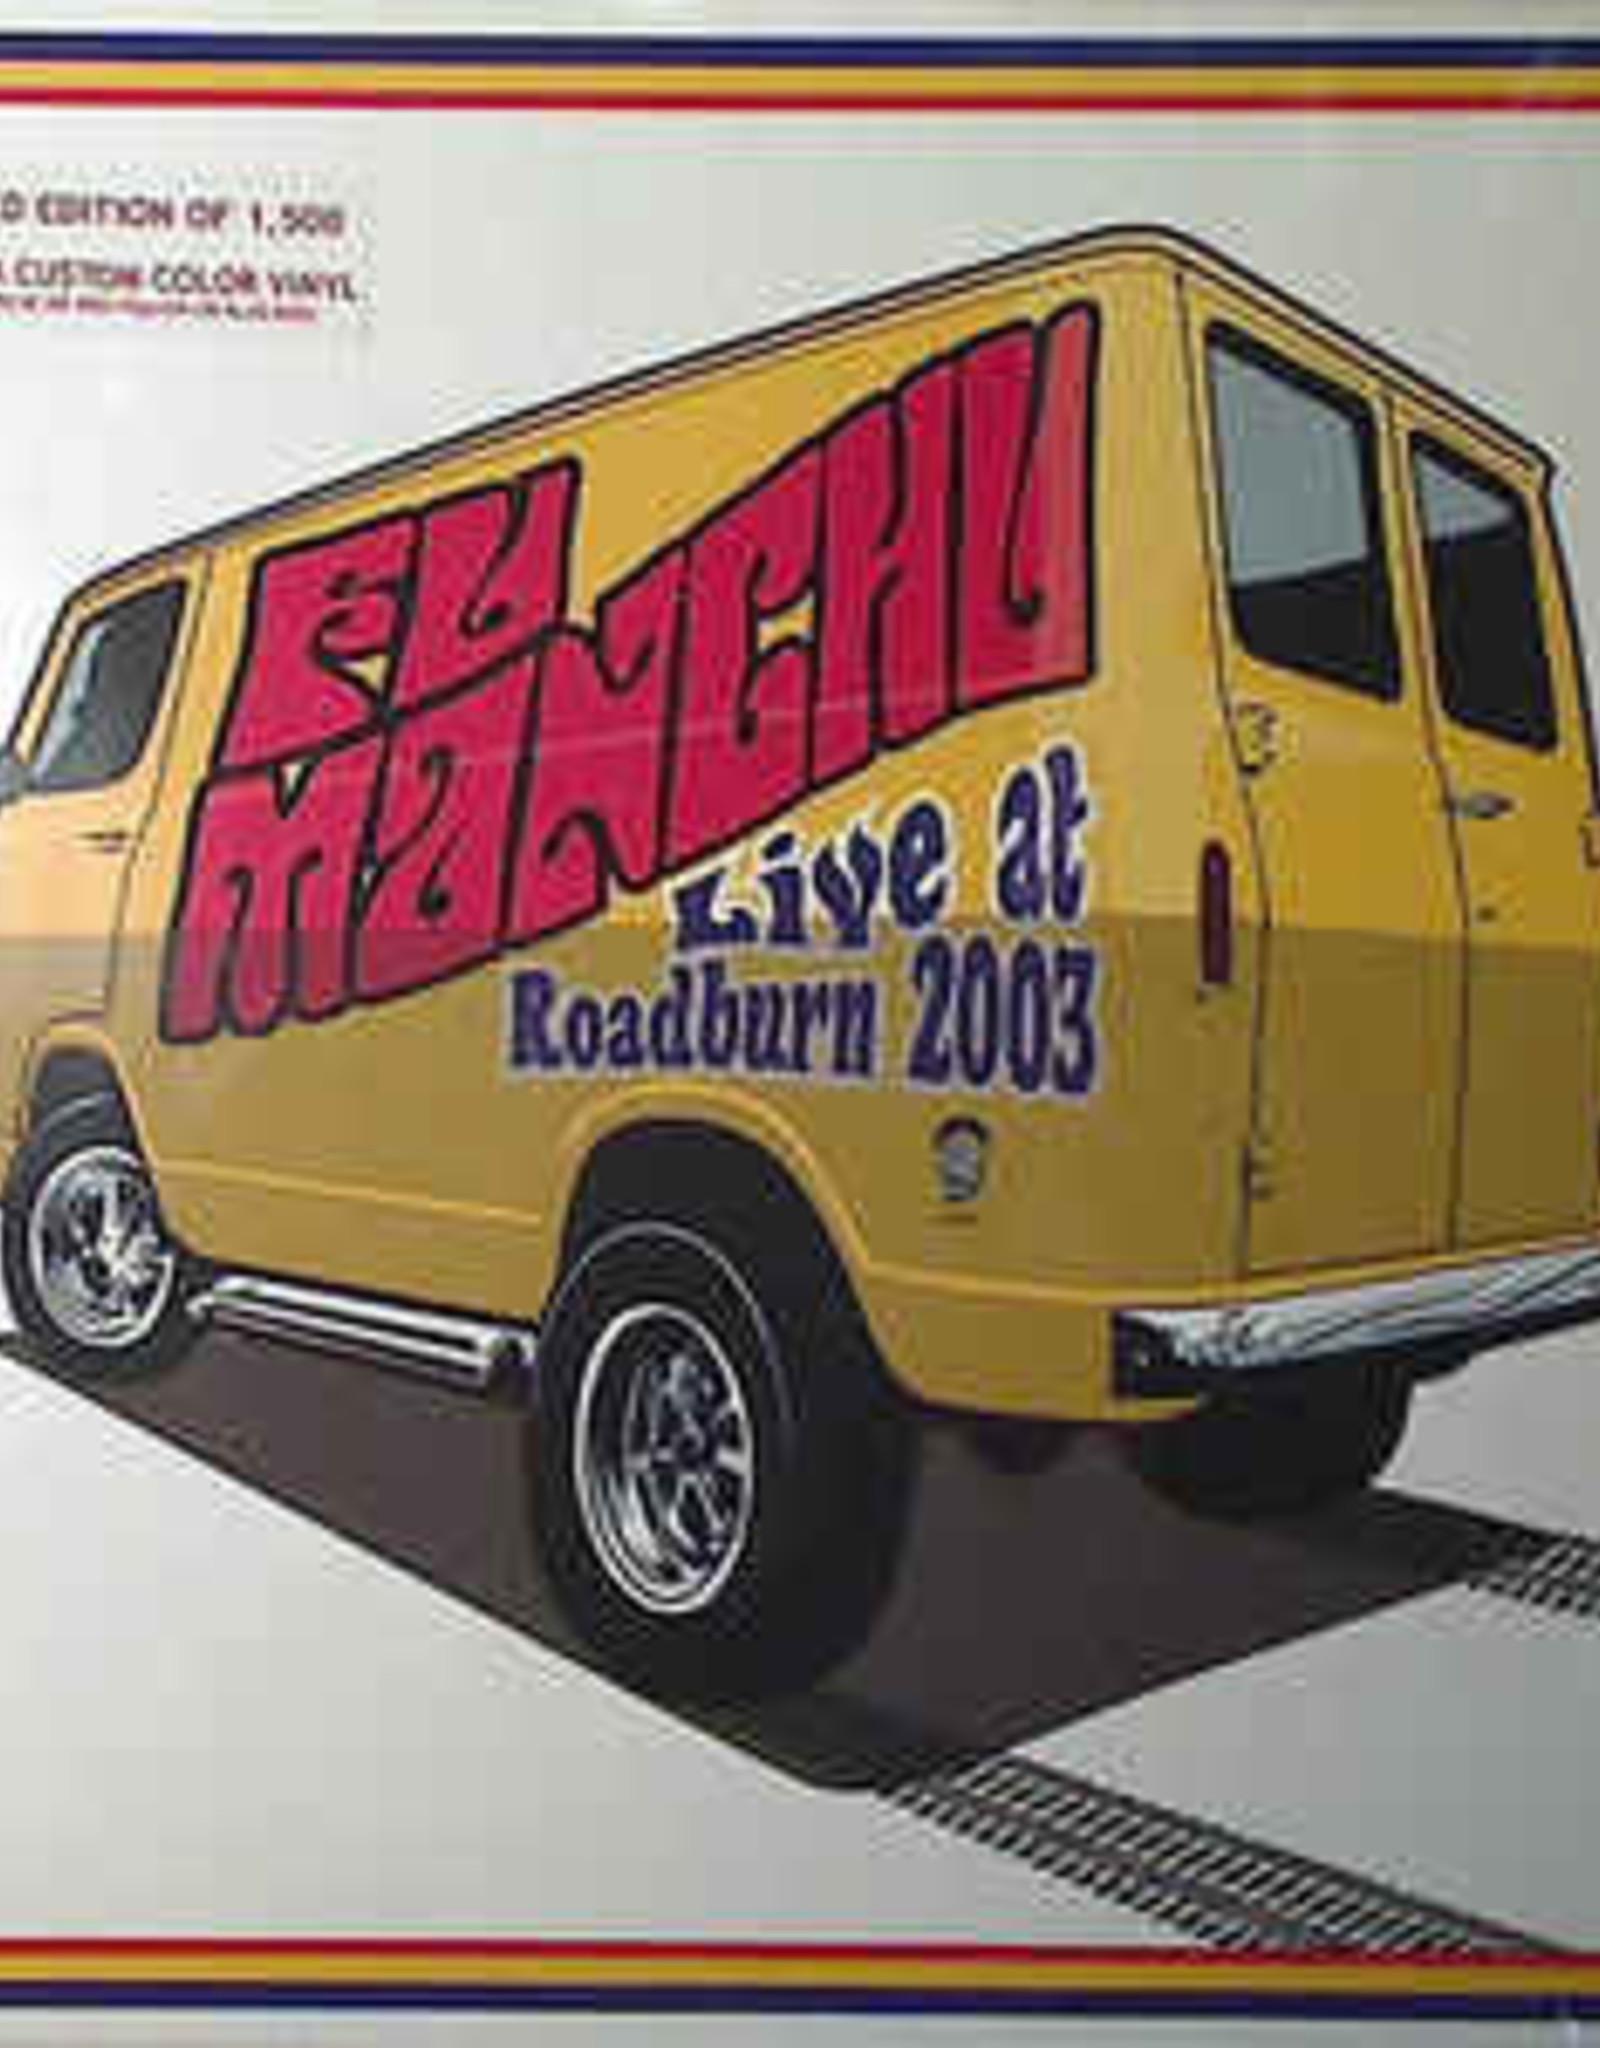 Fu Manchu - Live At Roadburn 2003 (Yellow/Blue, Yellow/Red, Or Blue/Red Vinyl) (Rsd 2019)